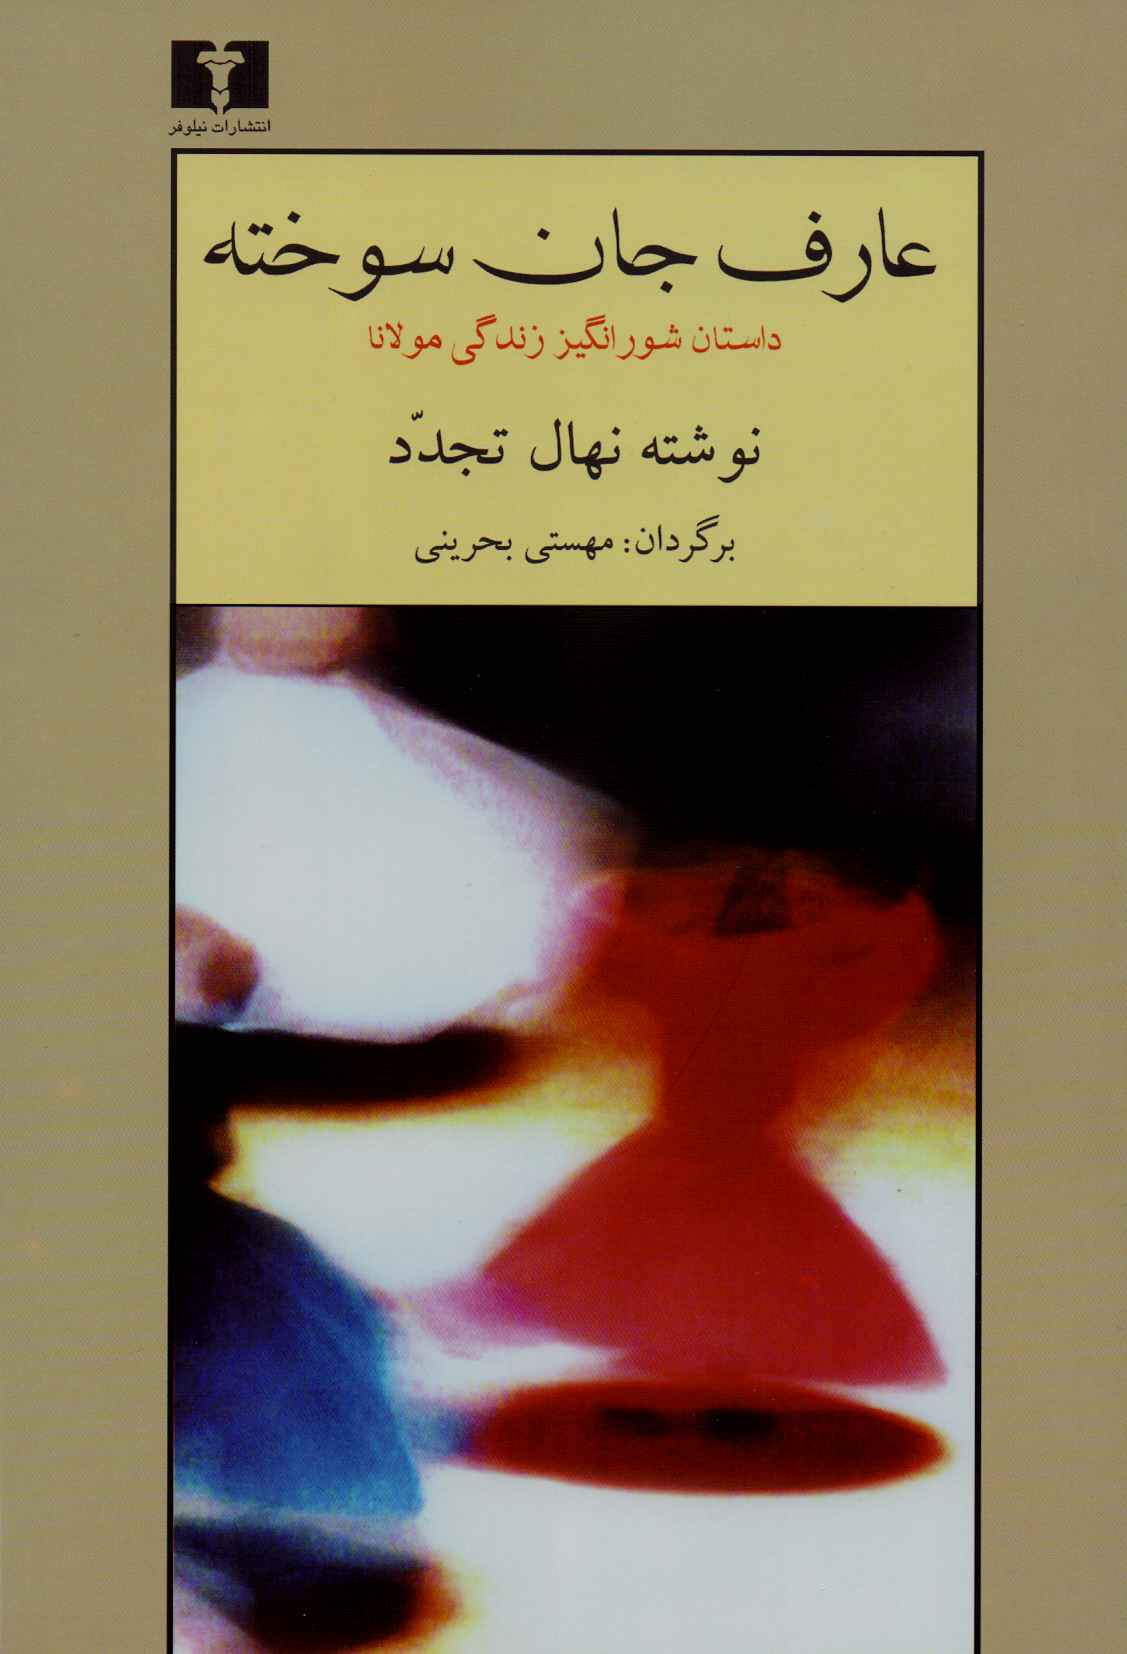 کتاب عارف جان سوخته